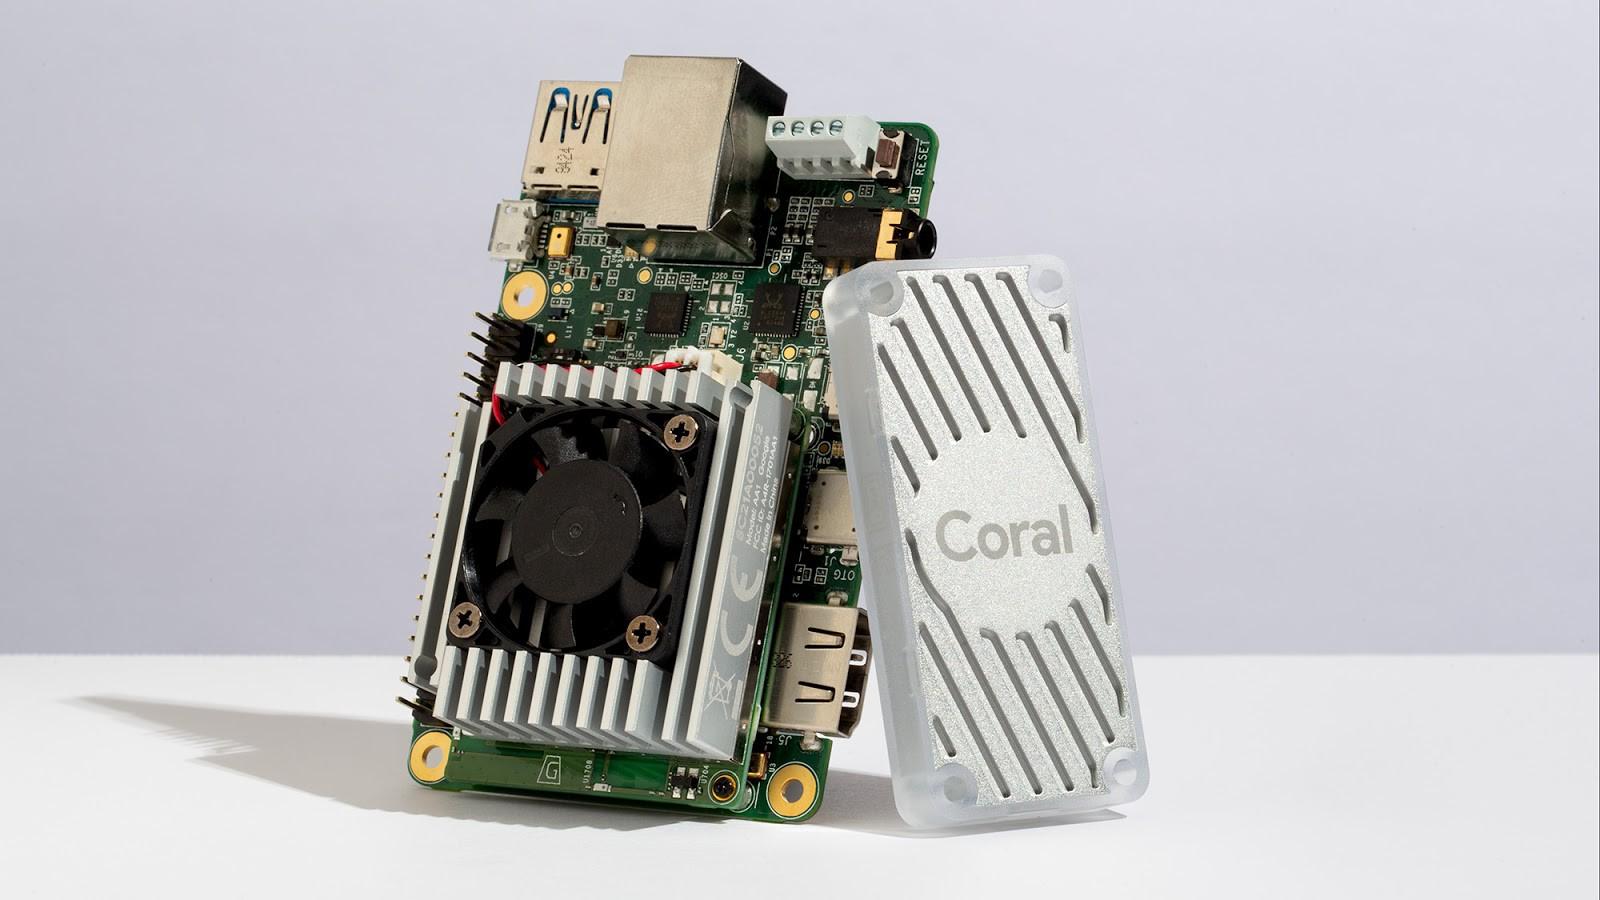 coral dev board